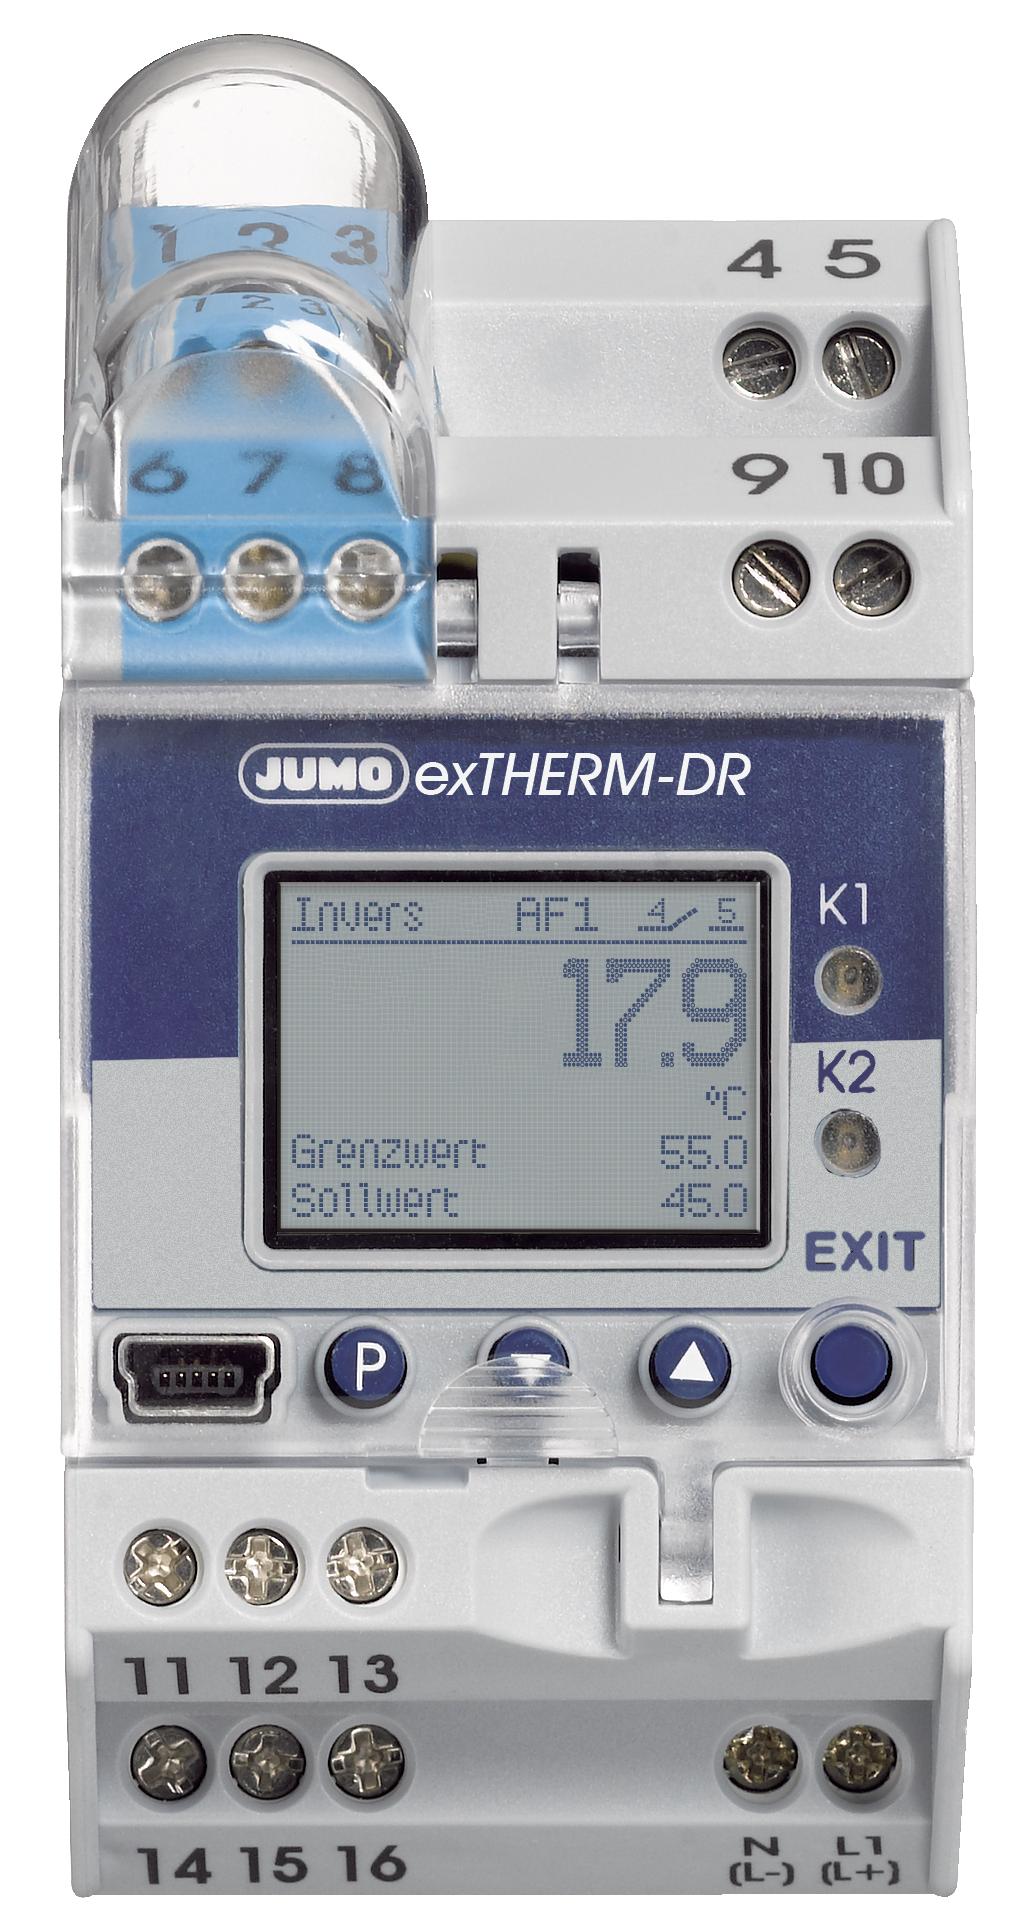 JUMO exTHERM-DR